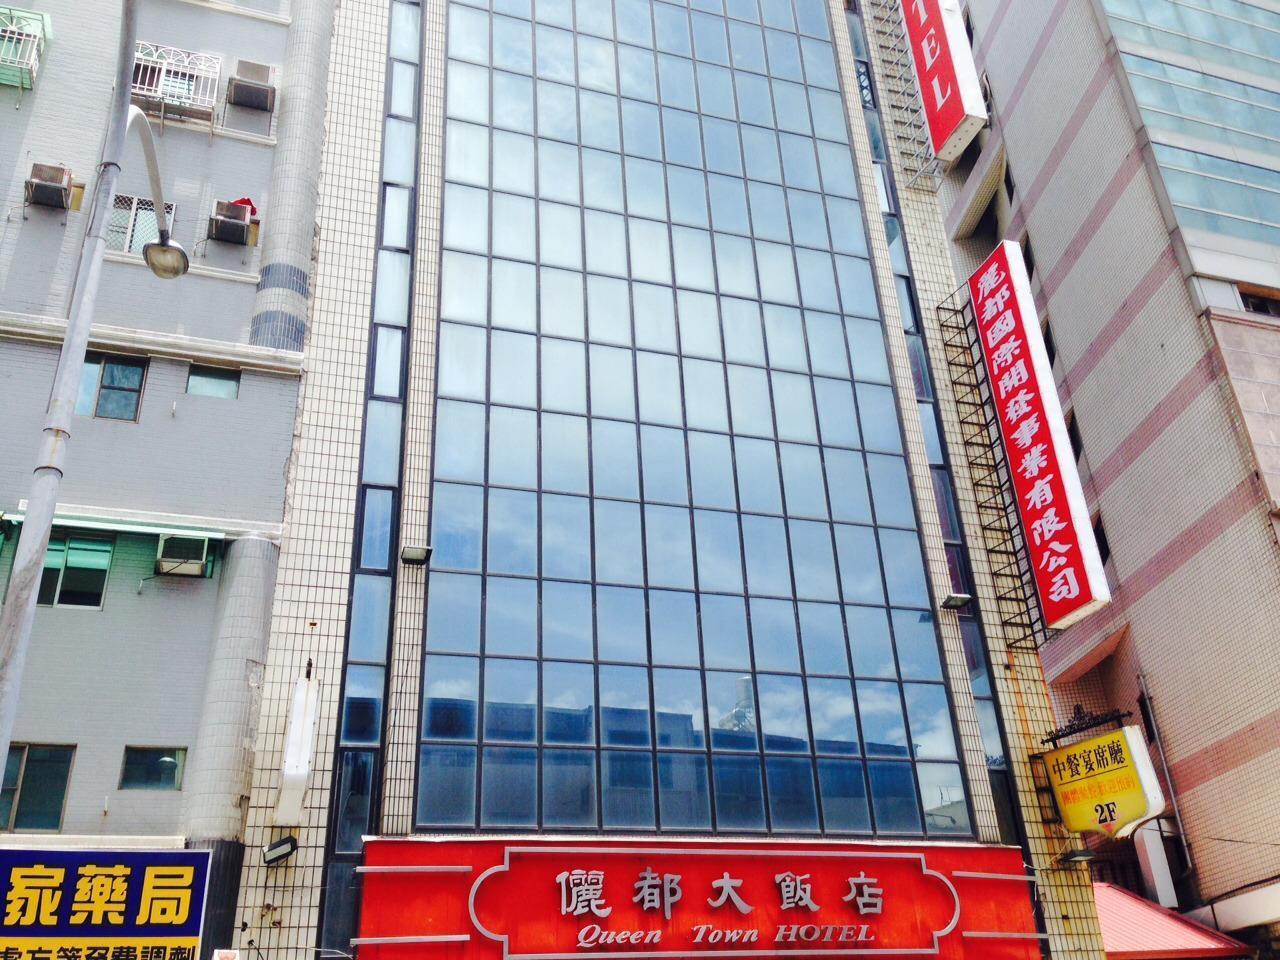 Li Duo Hotel